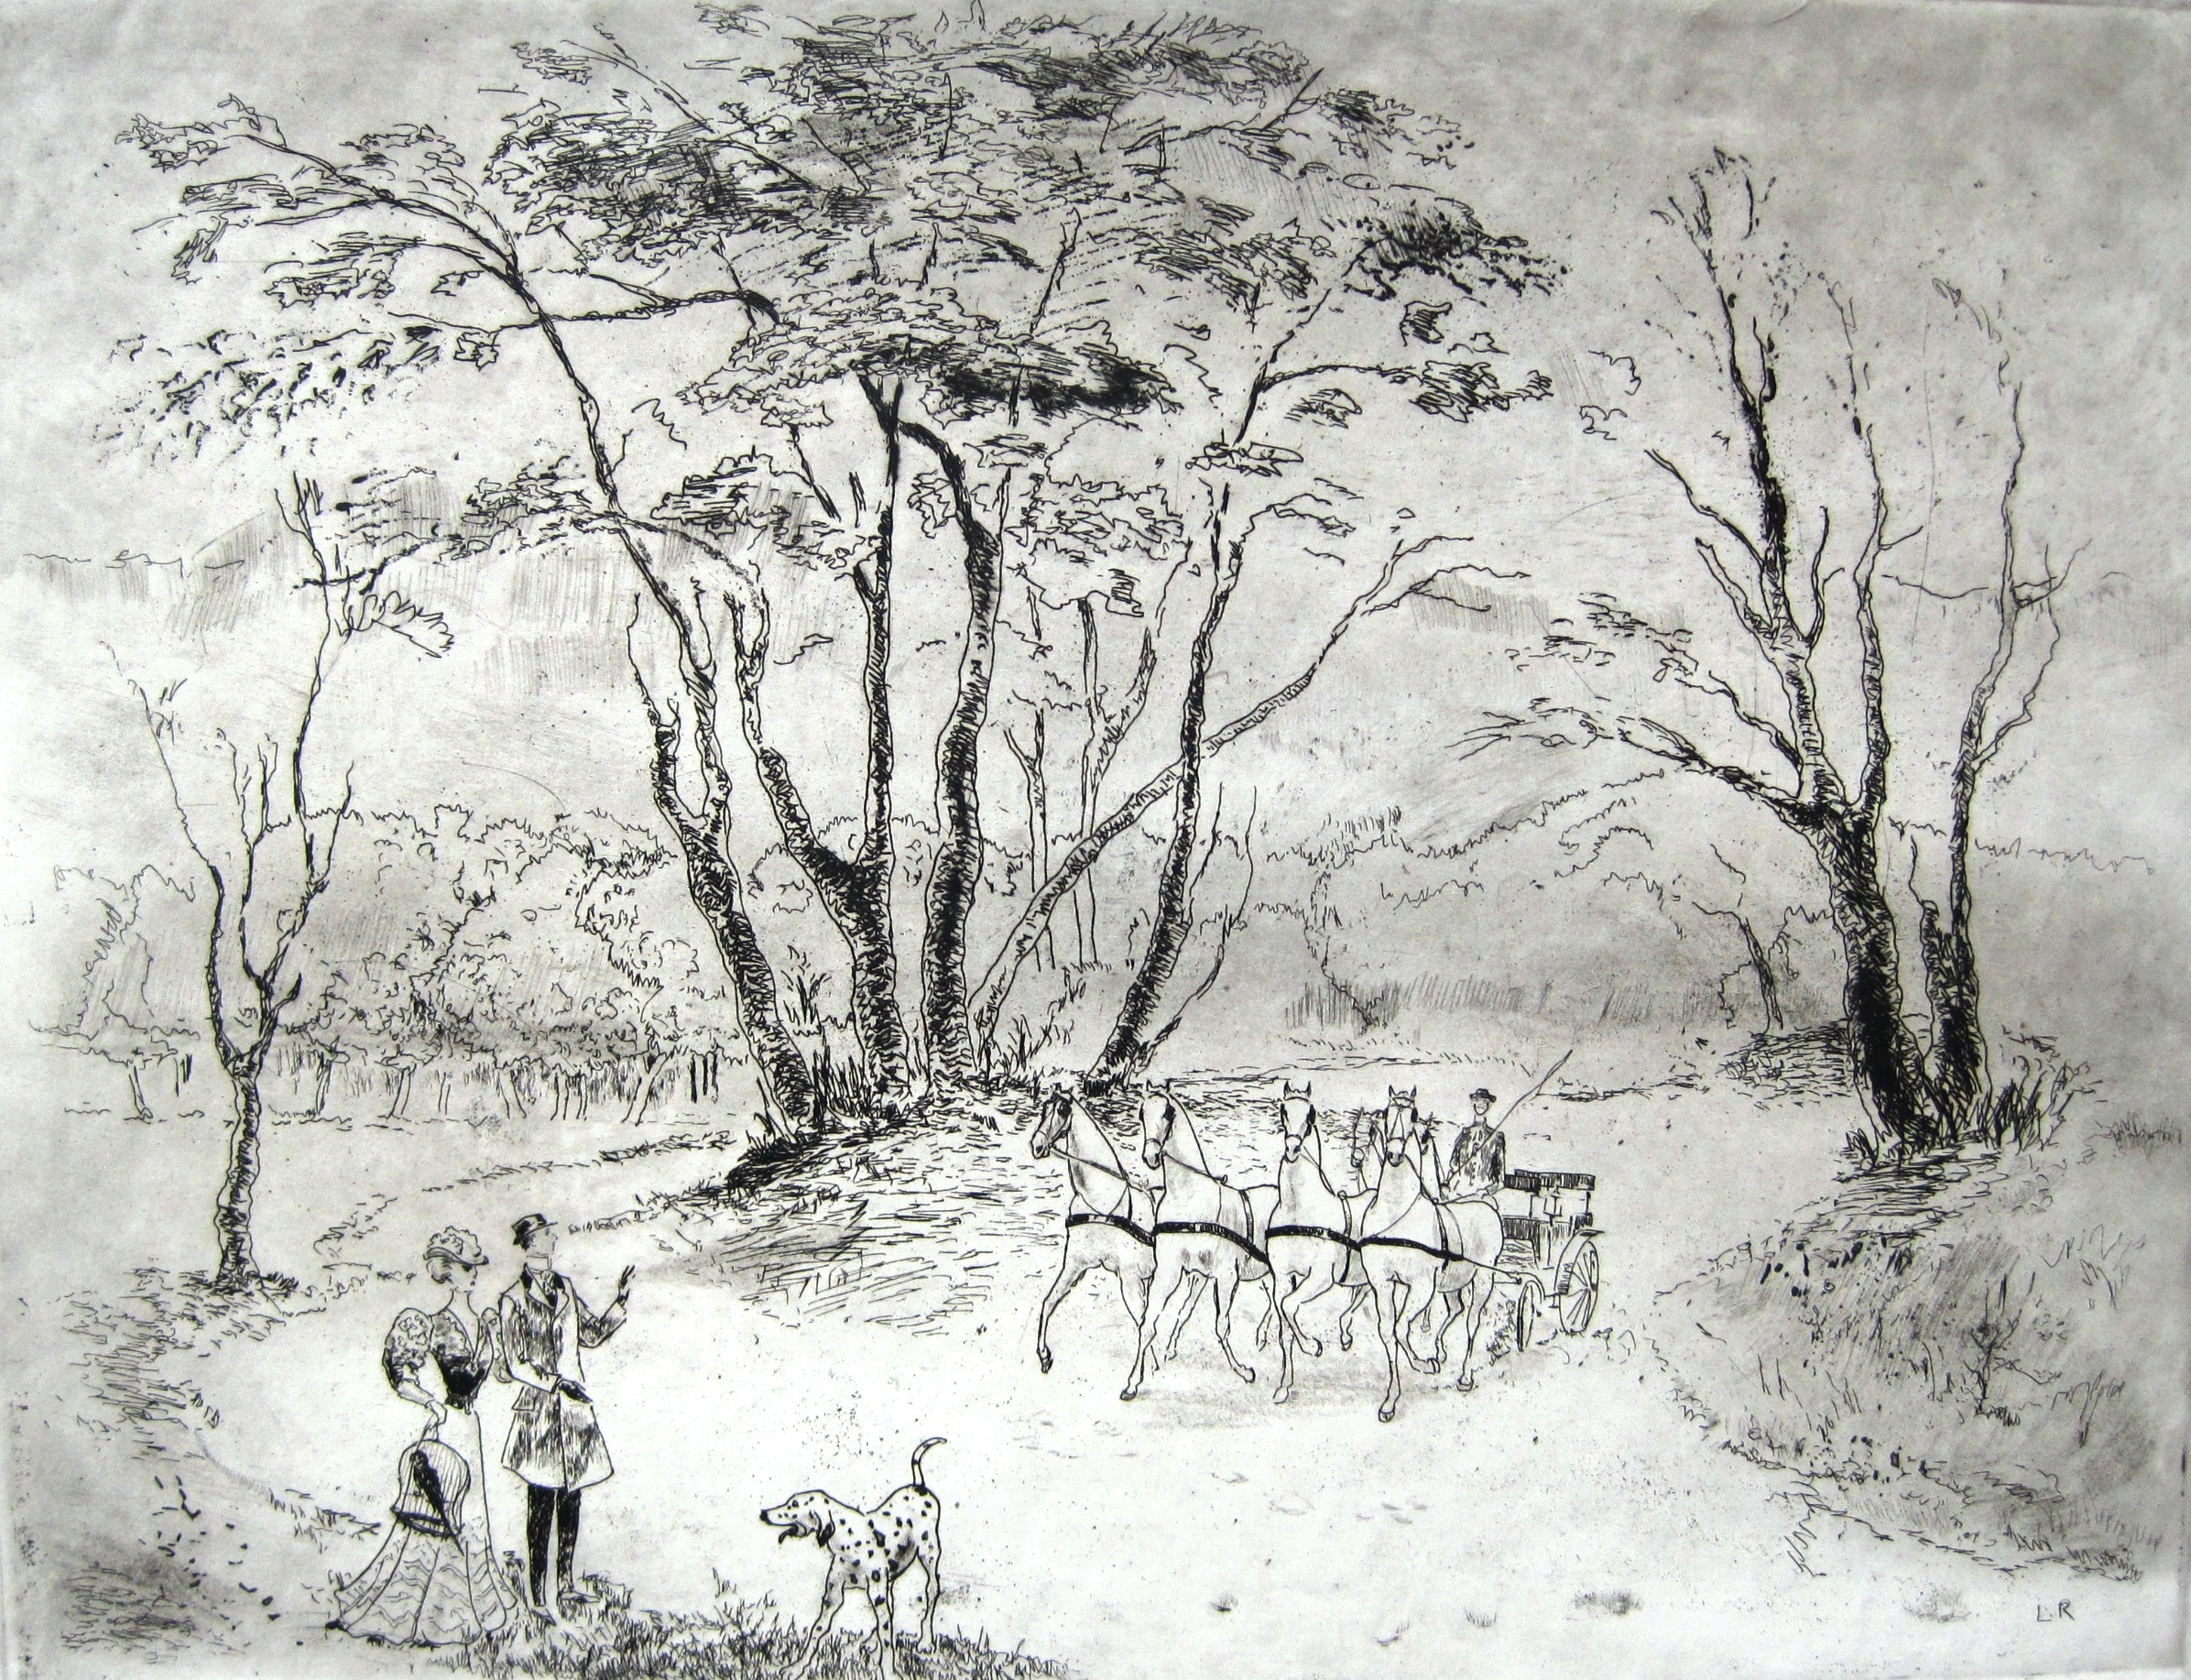 Láng, Rudolf: Six-horse carriage